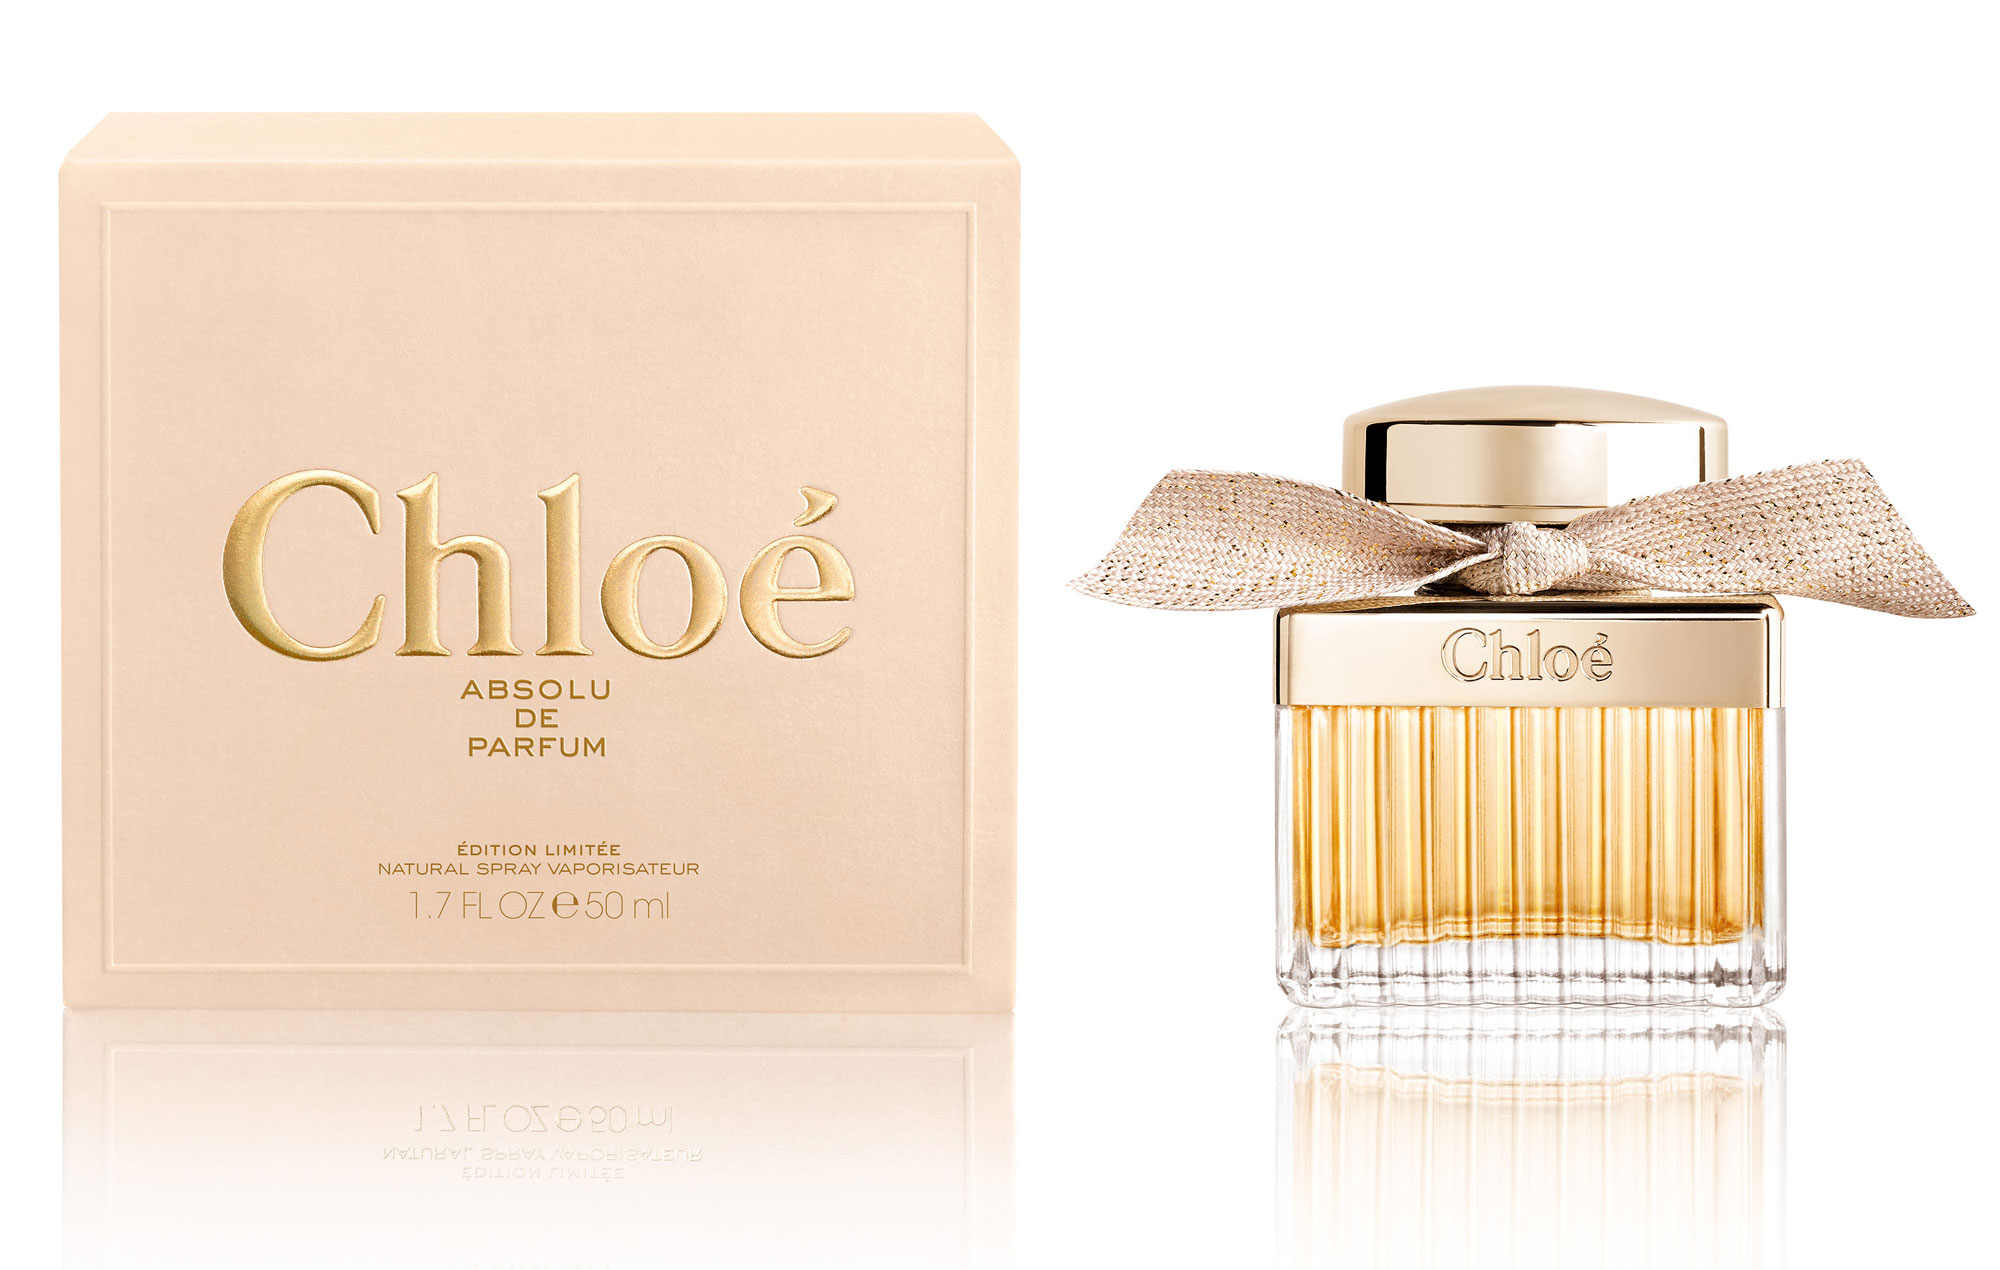 Chloé Absolu de Parfum Chloé voor dames